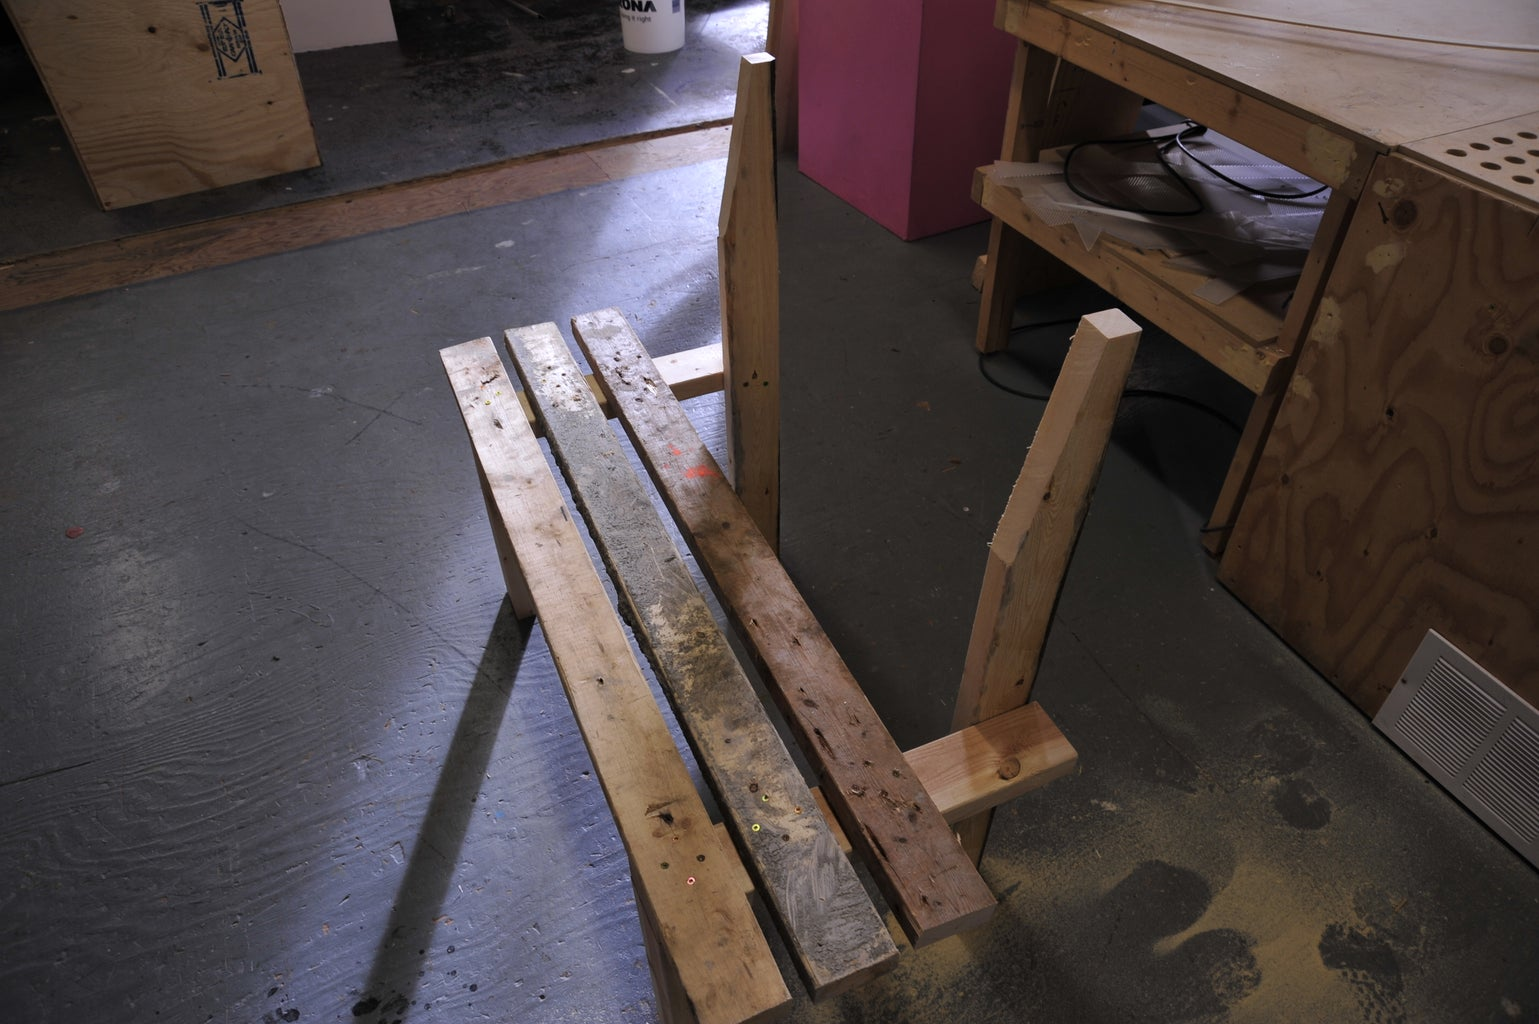 Fasten the Planks